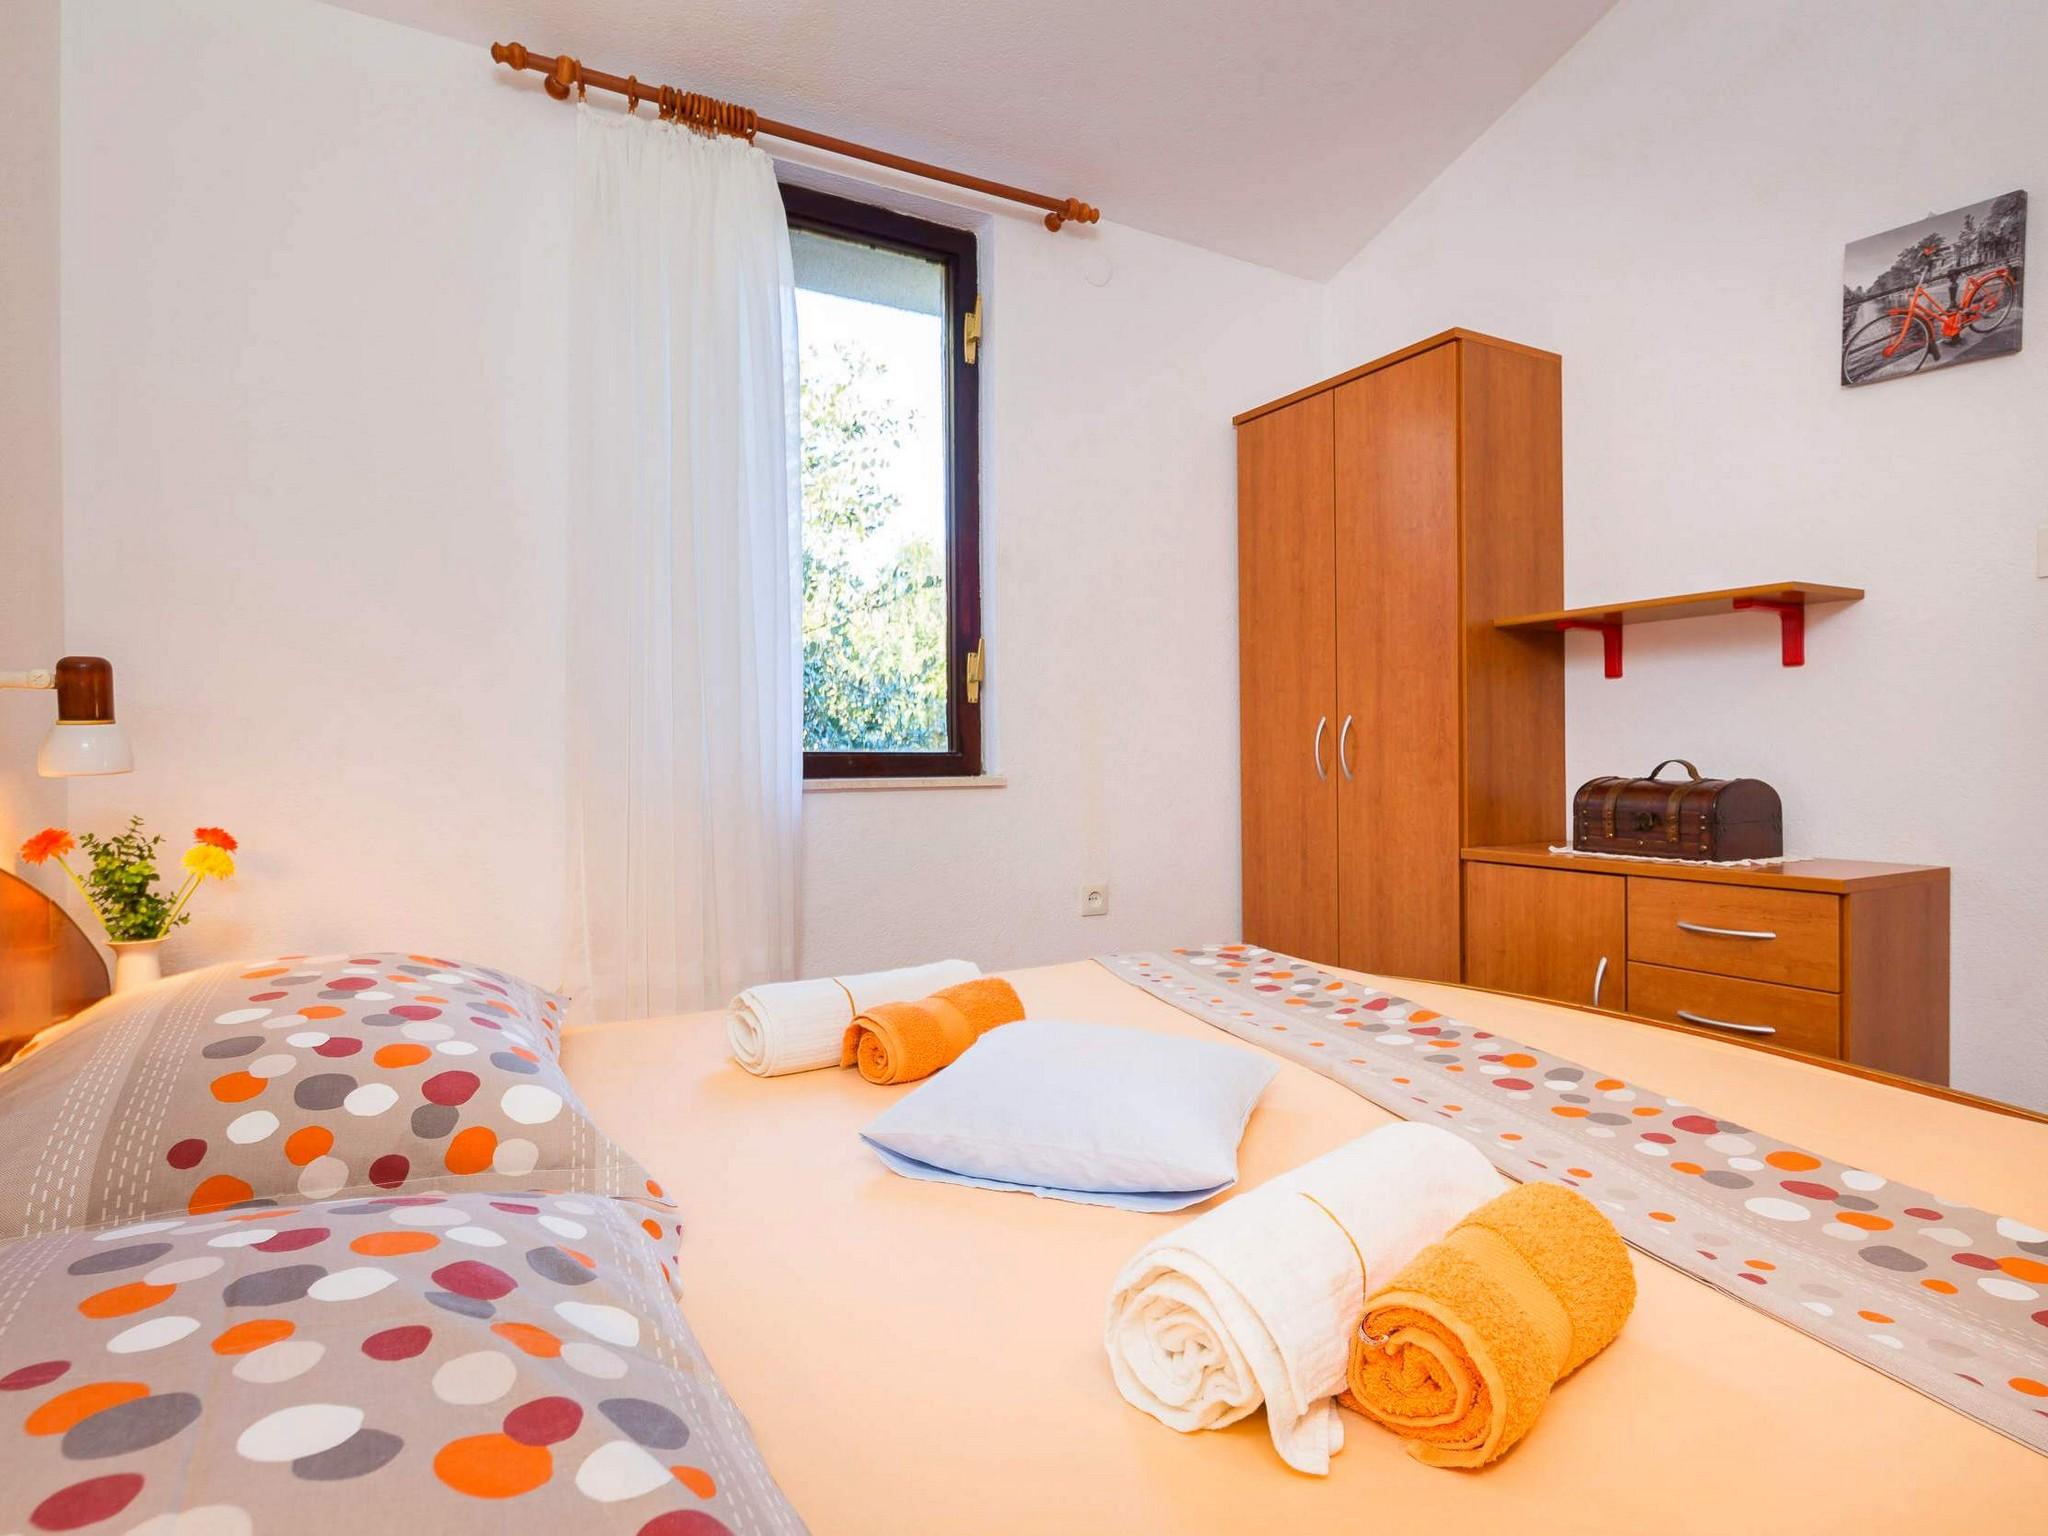 Ferienhaus Tanja, Kua K6+2 (940510), Kanica, , Dalmatien, Kroatien, Bild 31